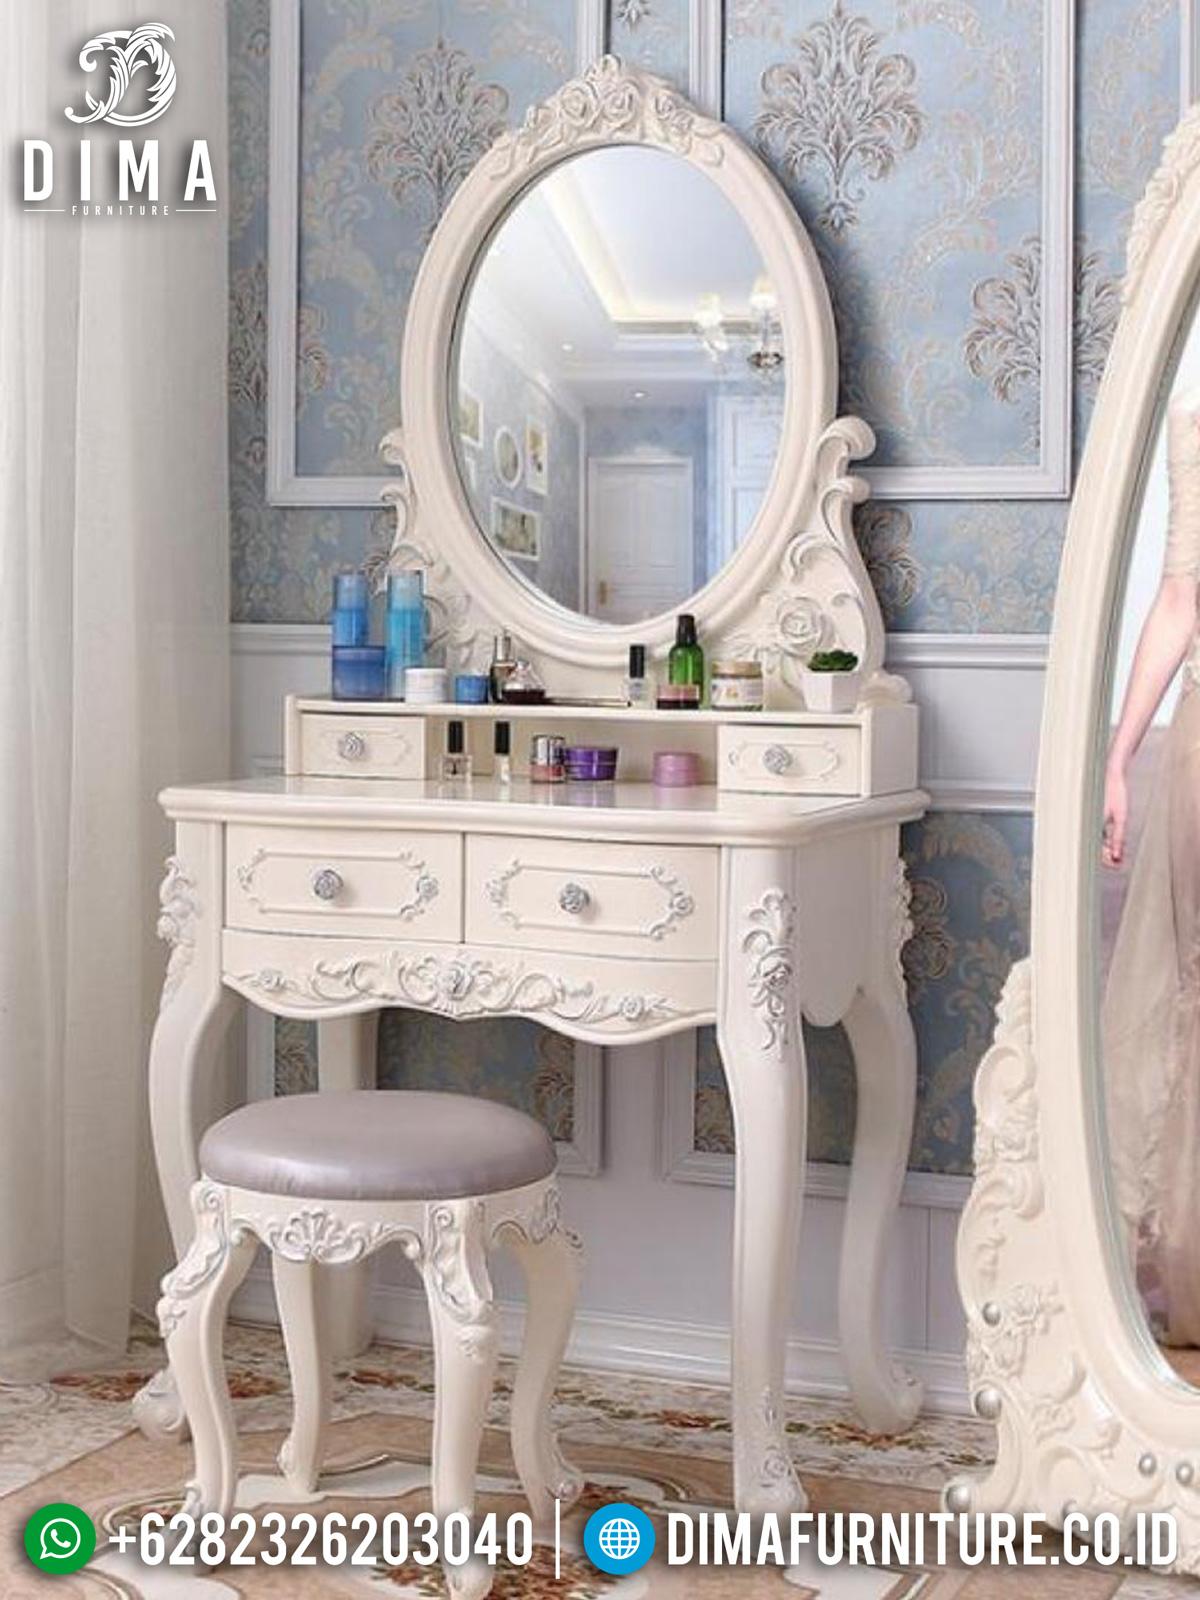 Set Meja Rias Minimalis Ukir Jepara Luxury Design White Duco Color TTJ-1448